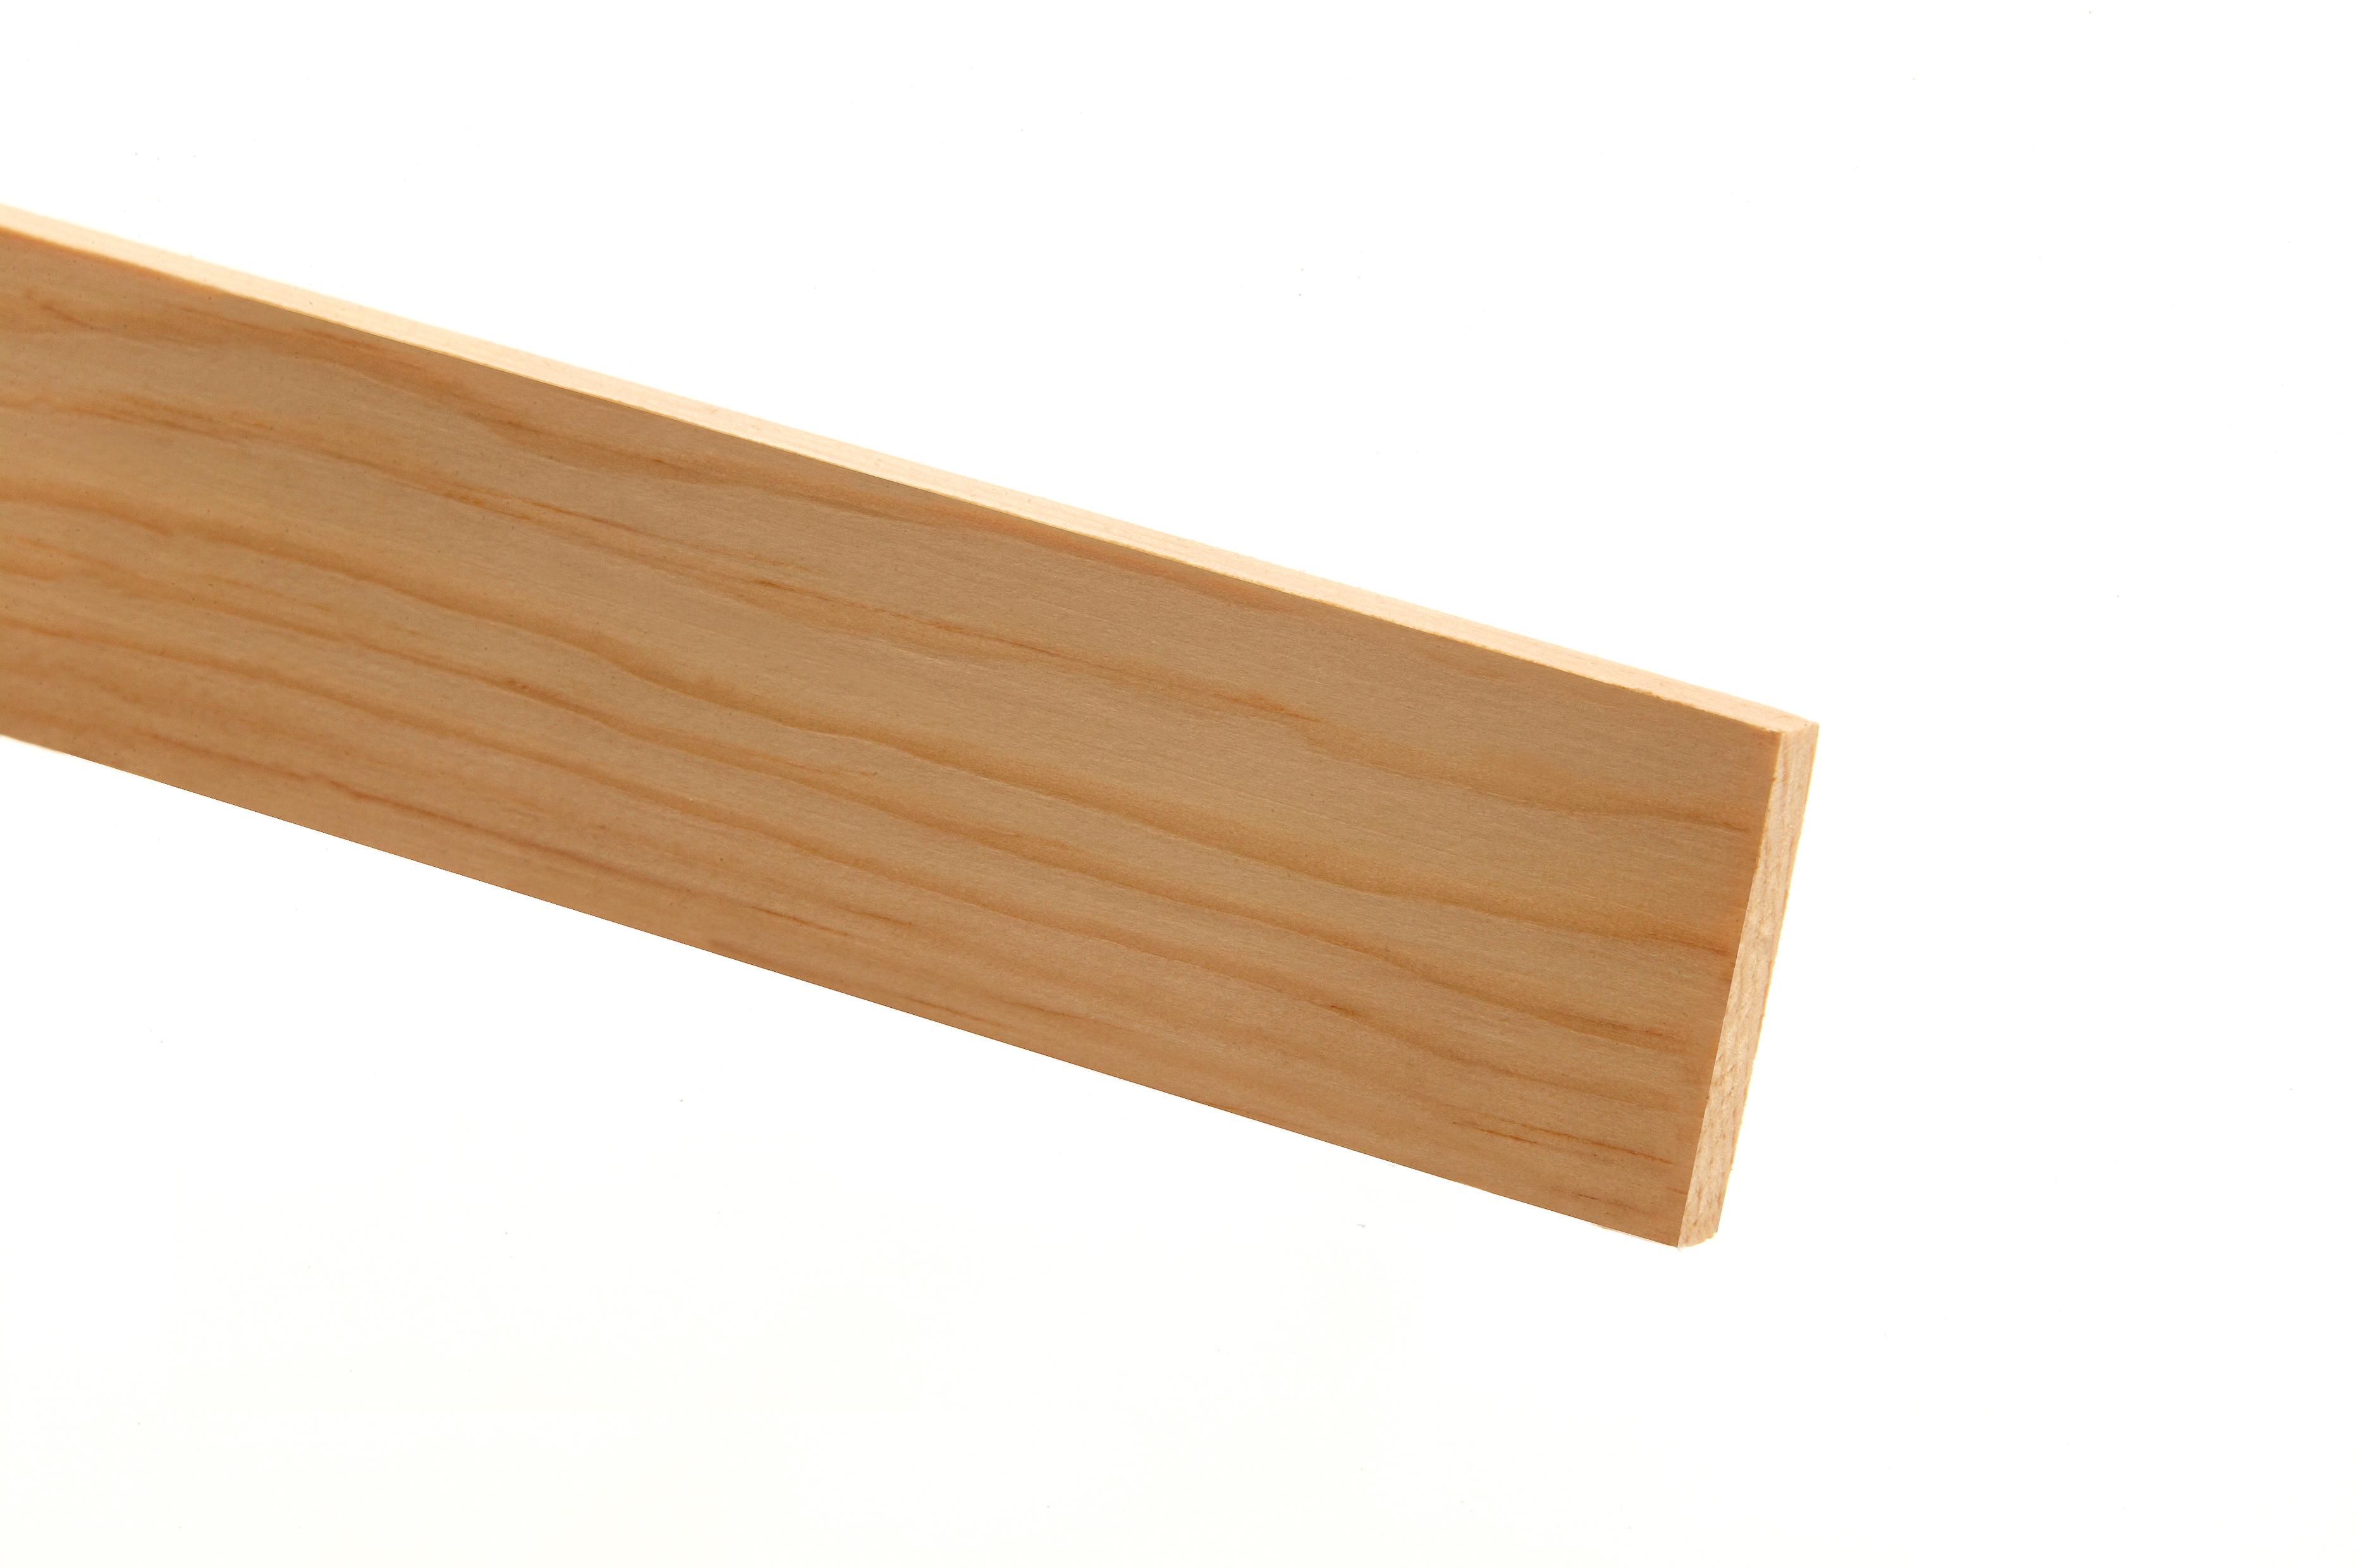 5 Pine PSE Stripwood 21 x 170 x 2400mm